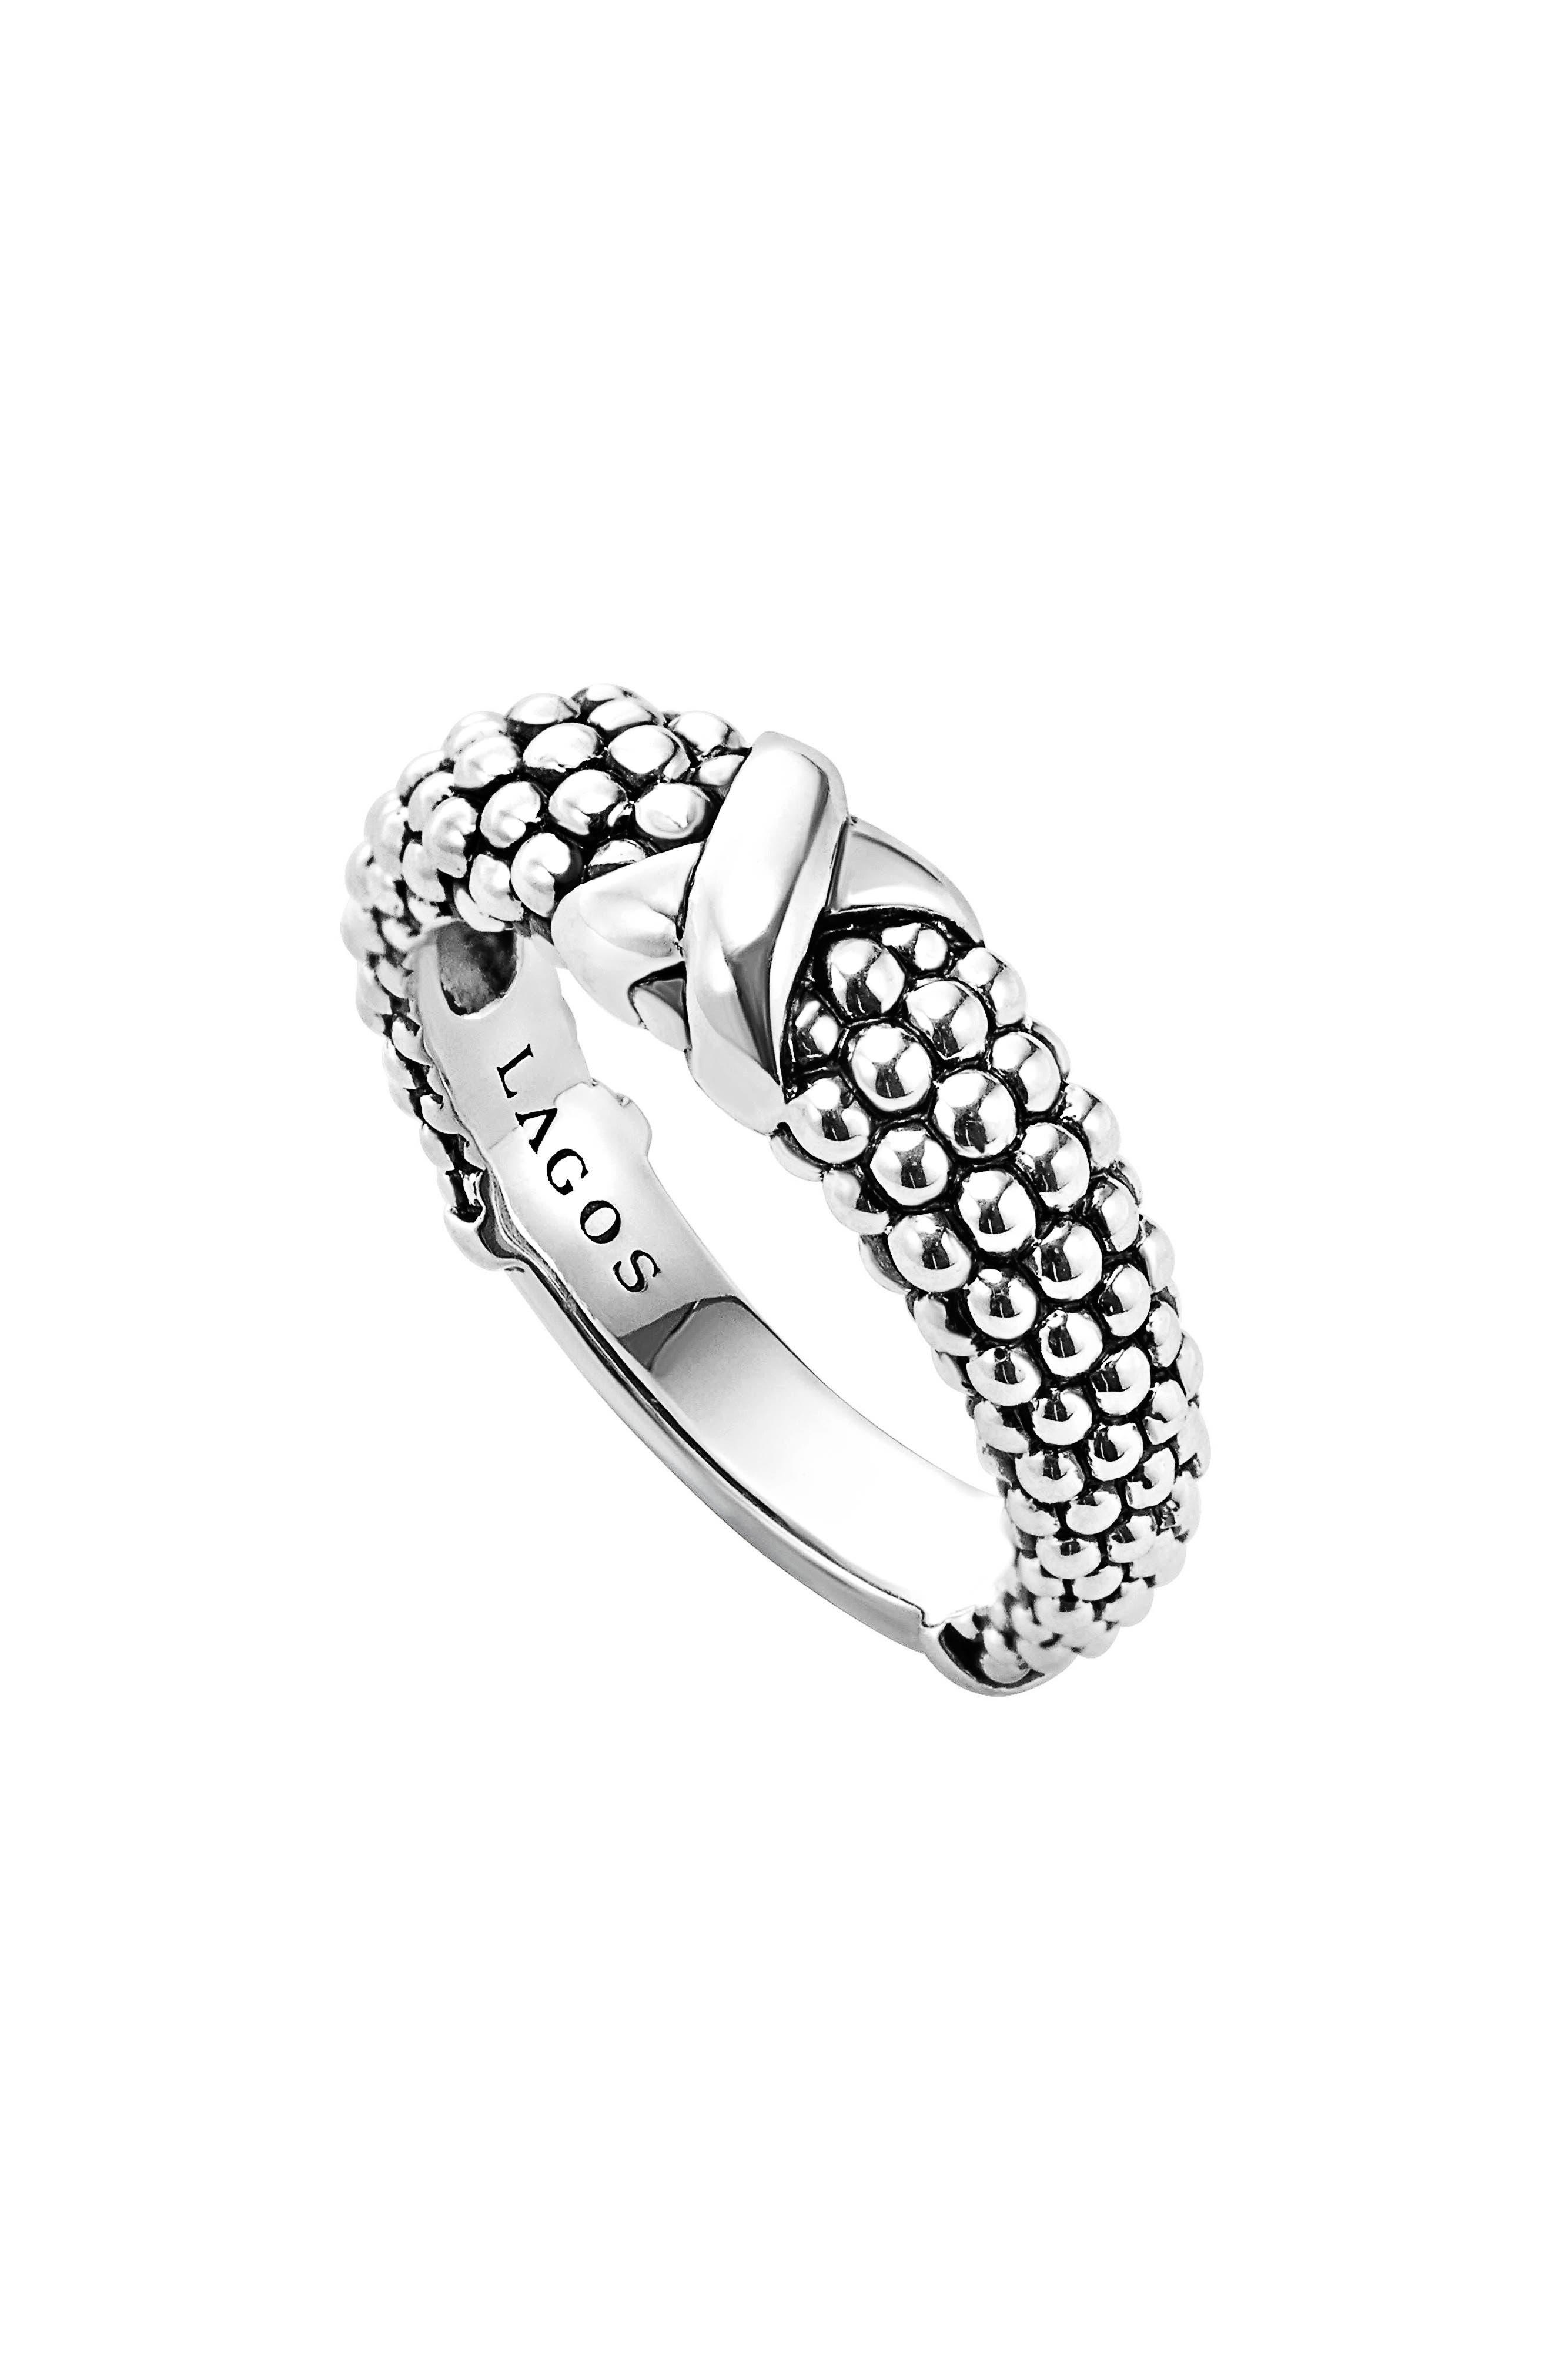 'Signature Caviar' Ring,                             Main thumbnail 1, color,                             040